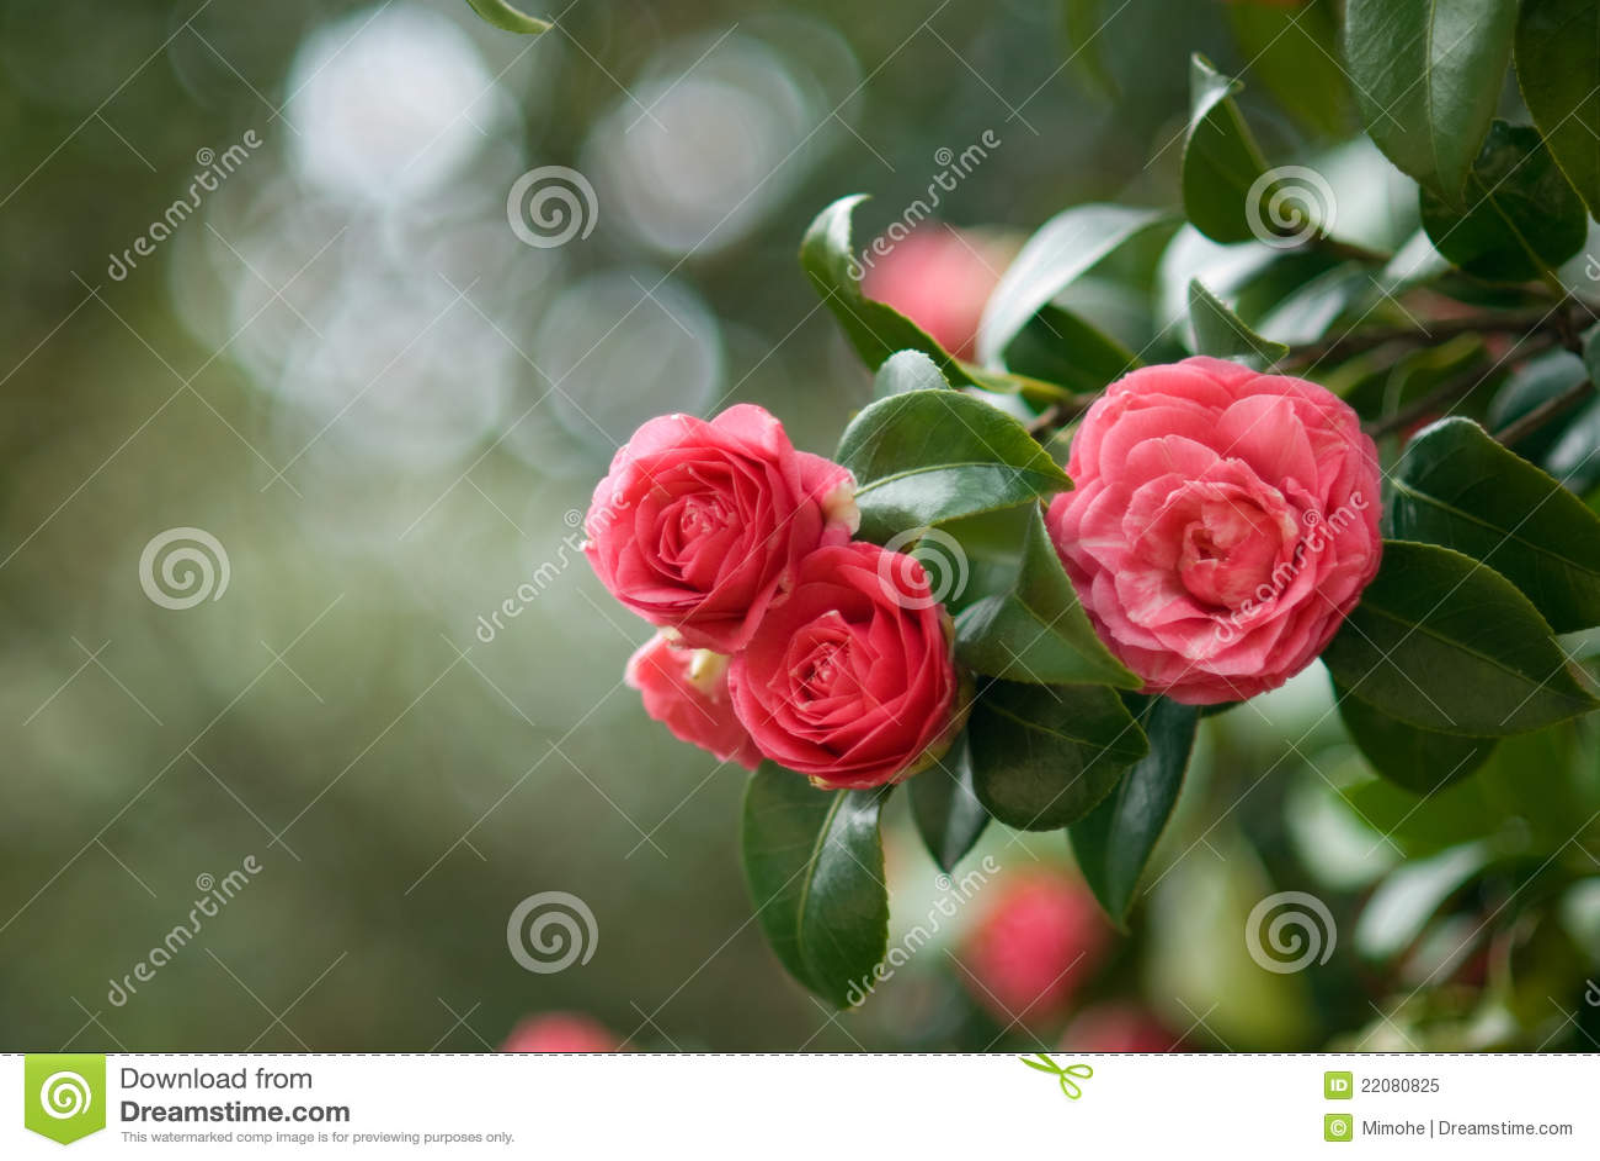 Camellia tree stock image image of camellia nature - Camelia fotos ...